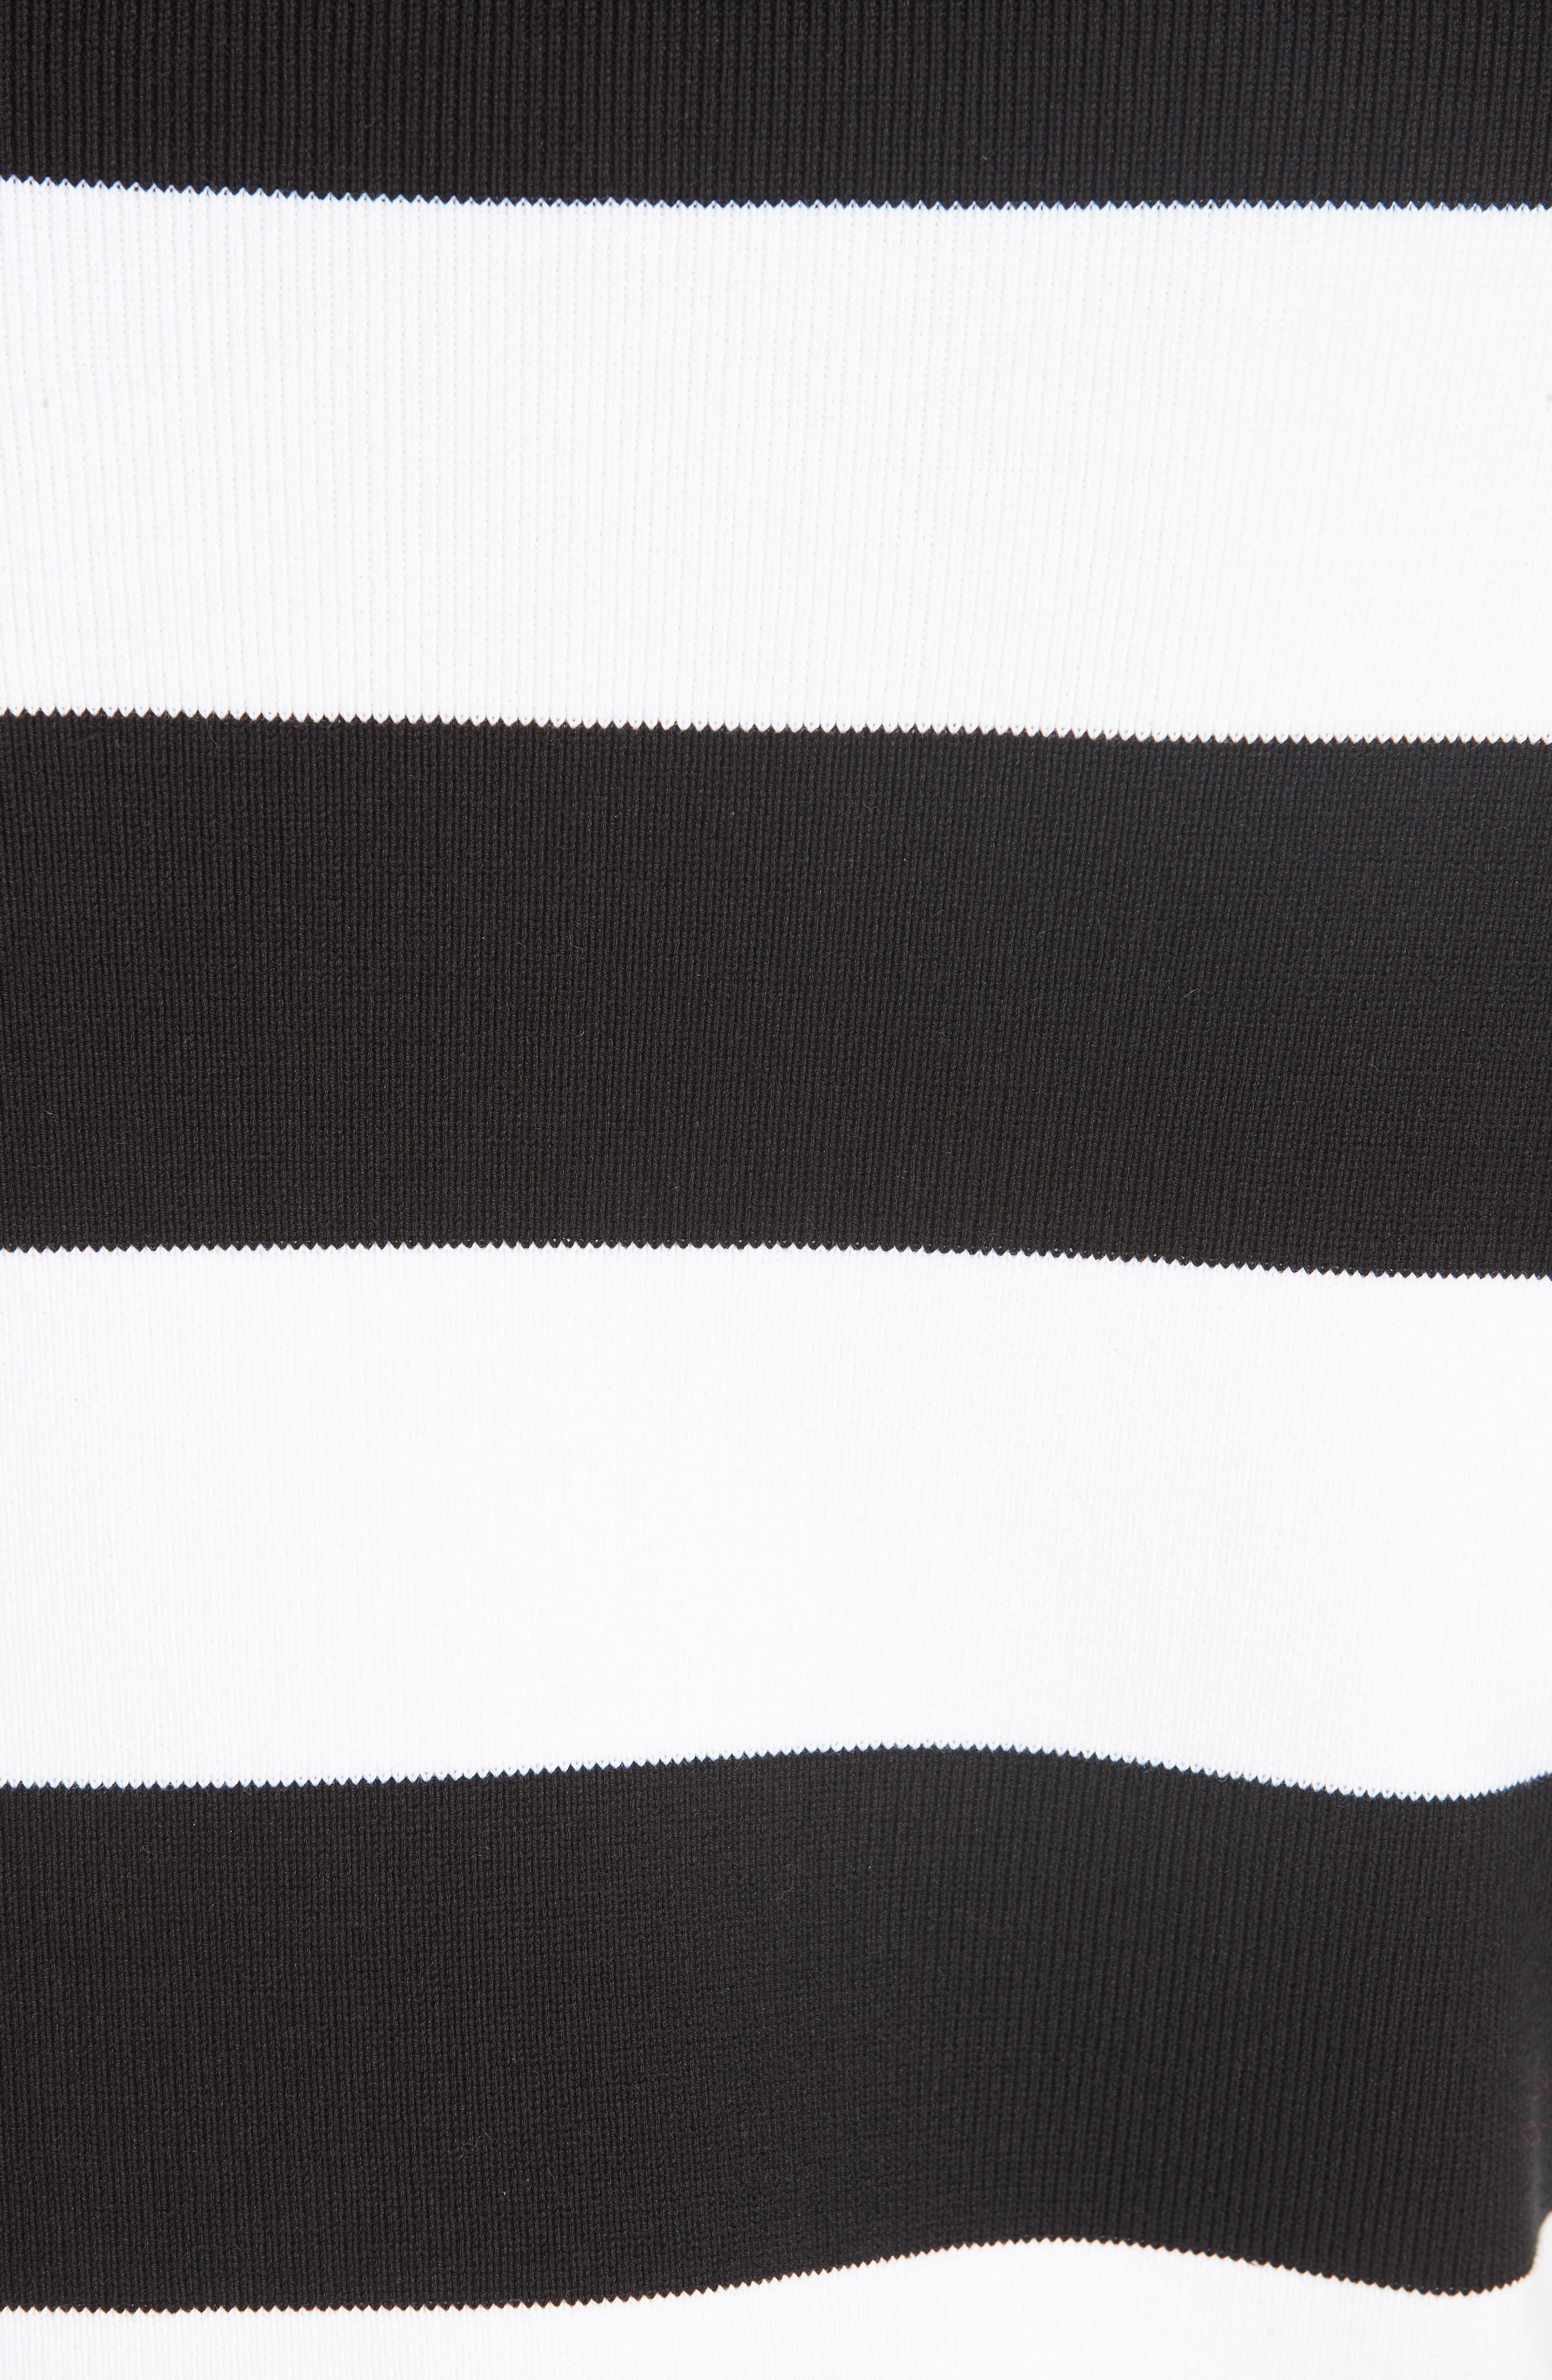 Starfish Embellished Scallop Hem Sweater,                             Alternate thumbnail 6, color,                             BLACK/ WHITE